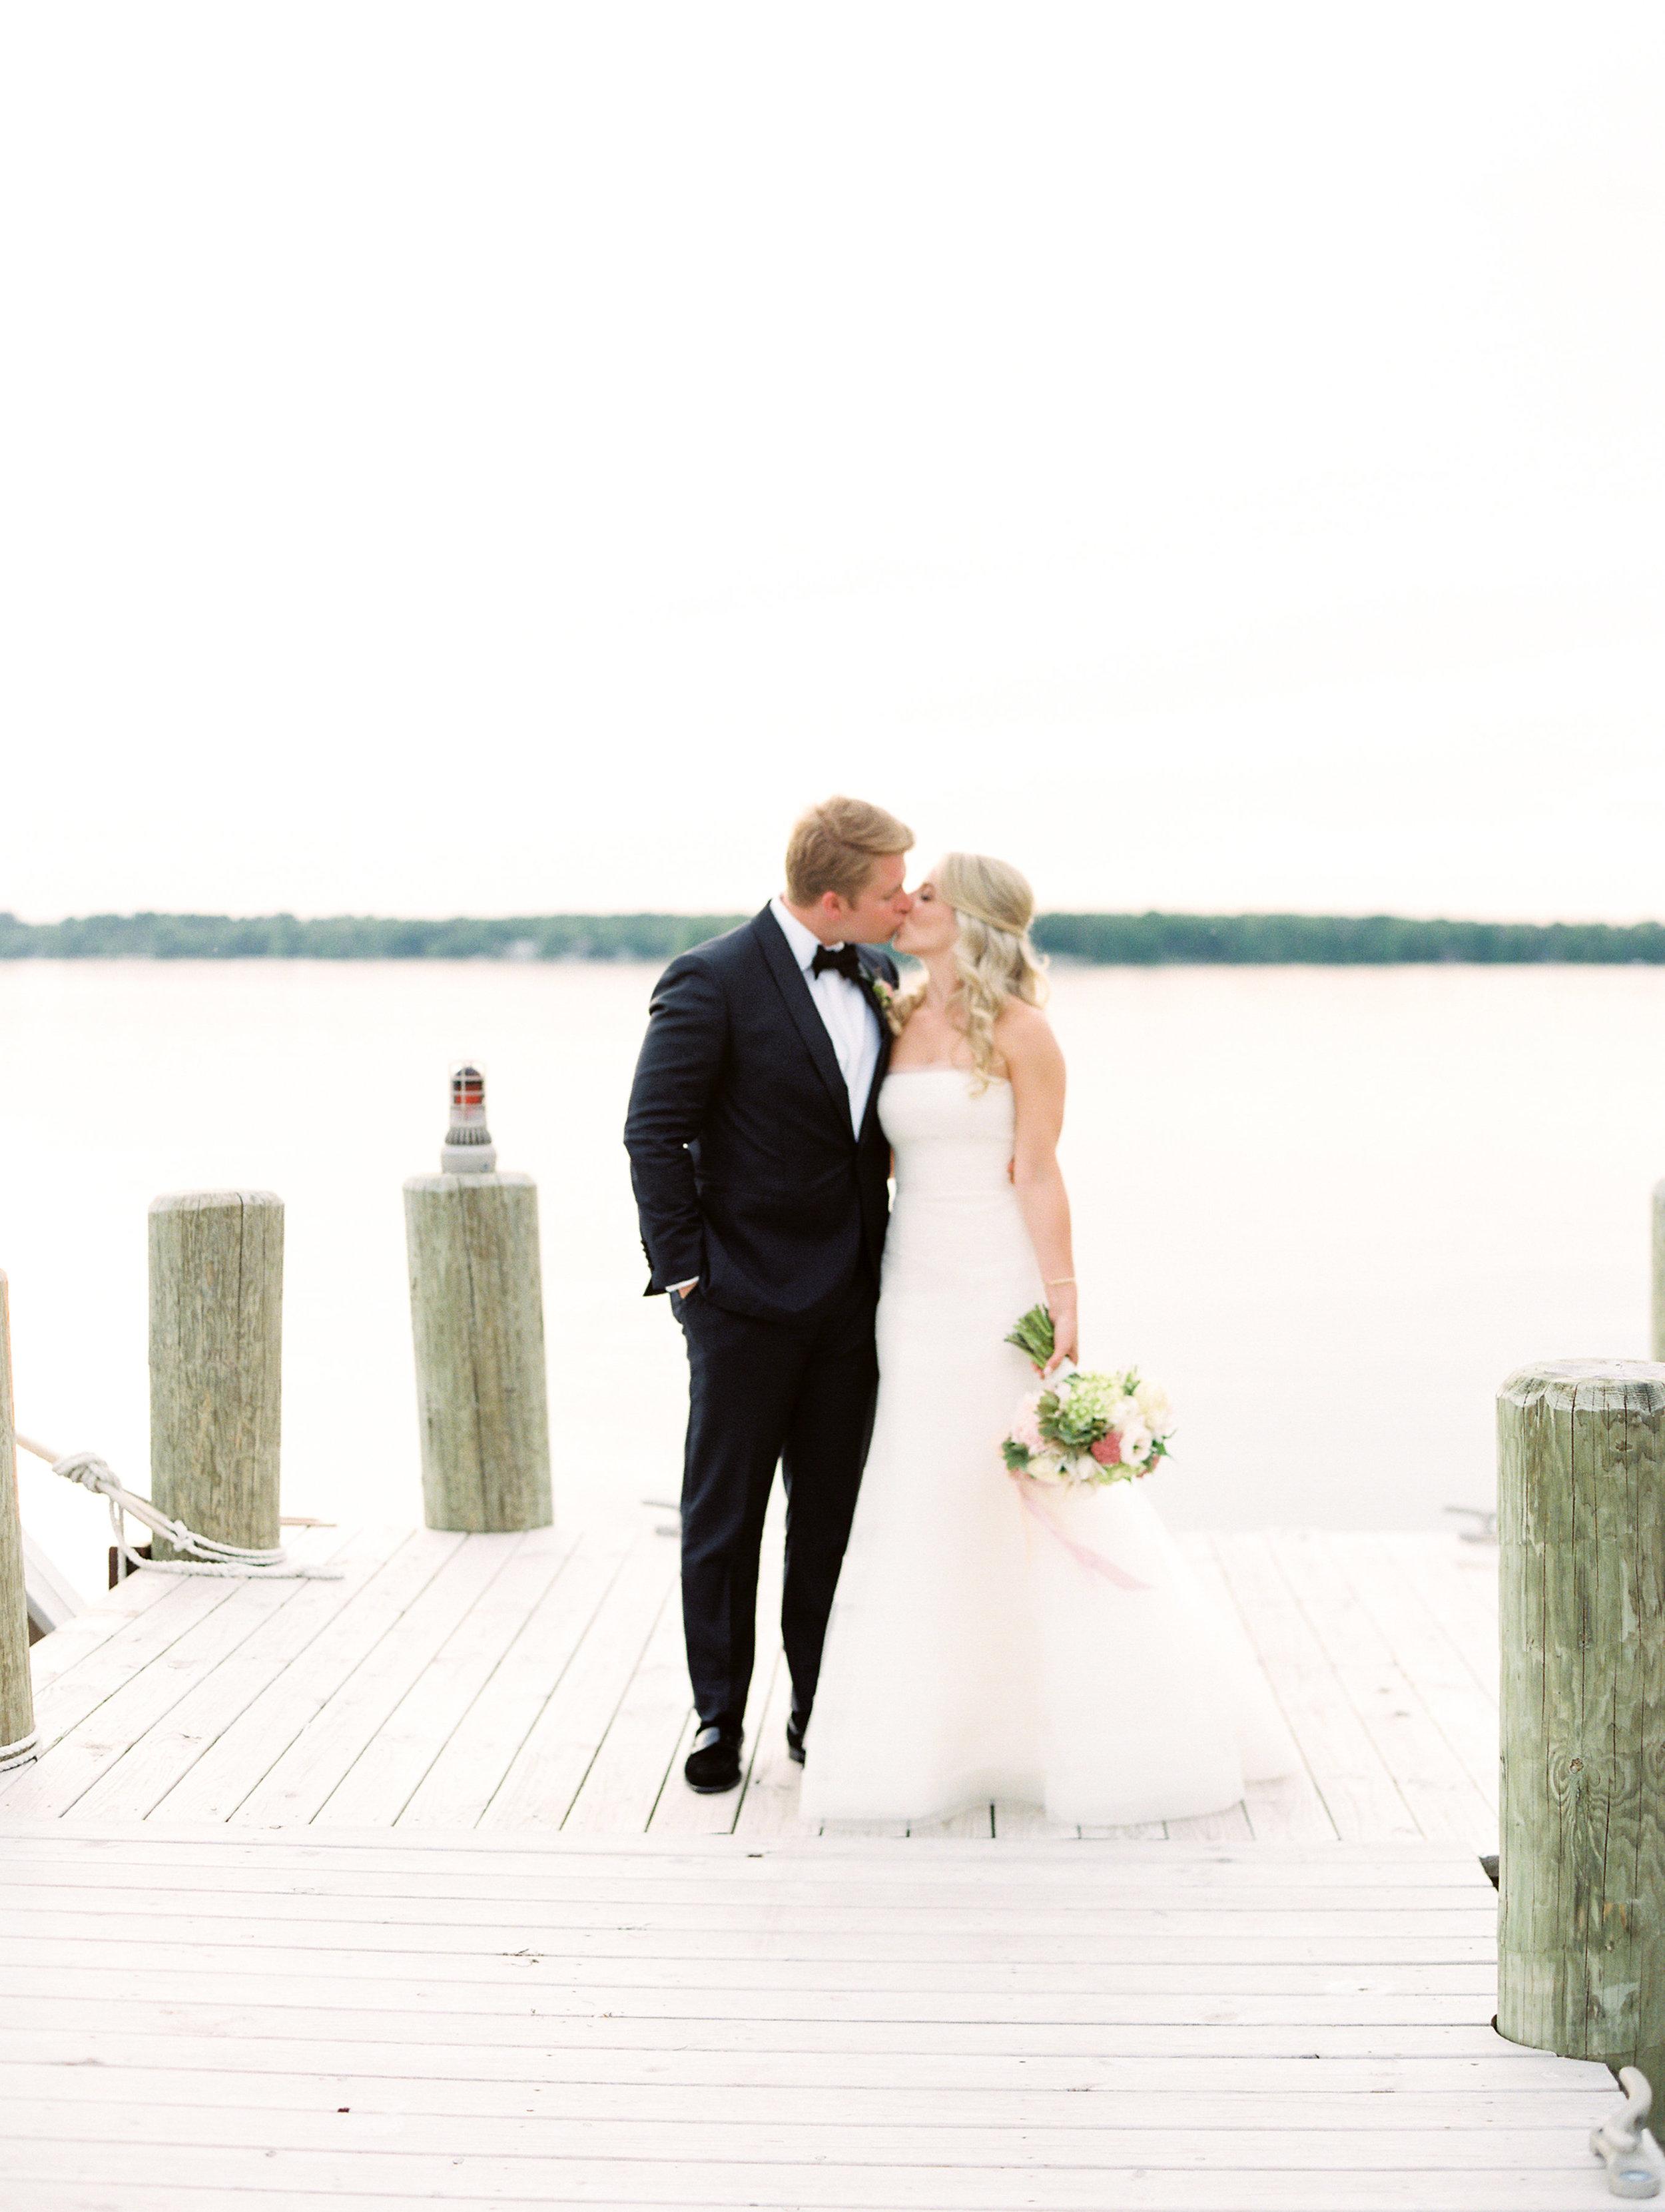 Coffman+Wedding+Bride+Groom+Sunset-60.jpg